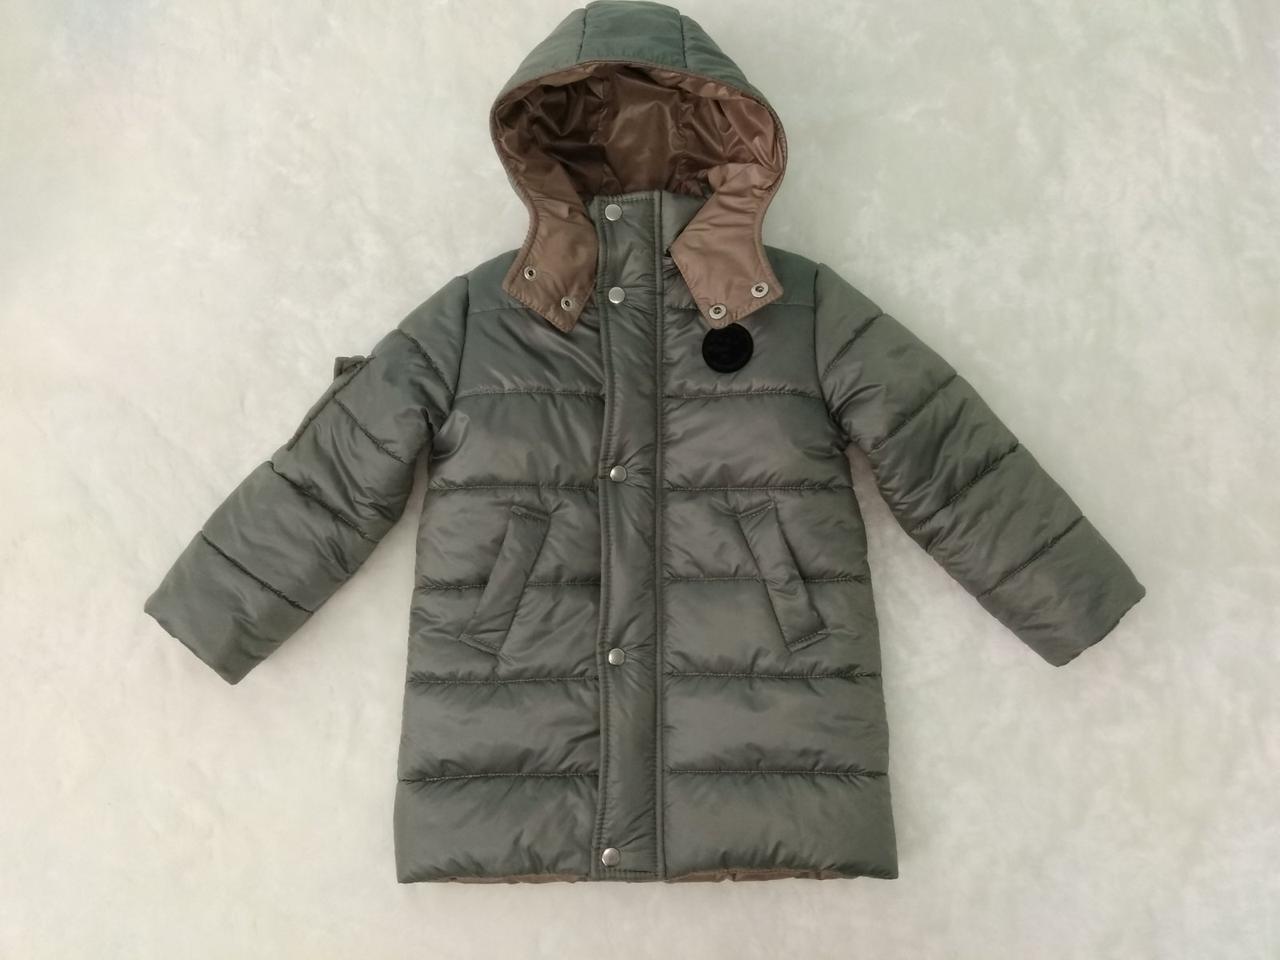 Куртка удлинённая зимняя. Размер 104-110